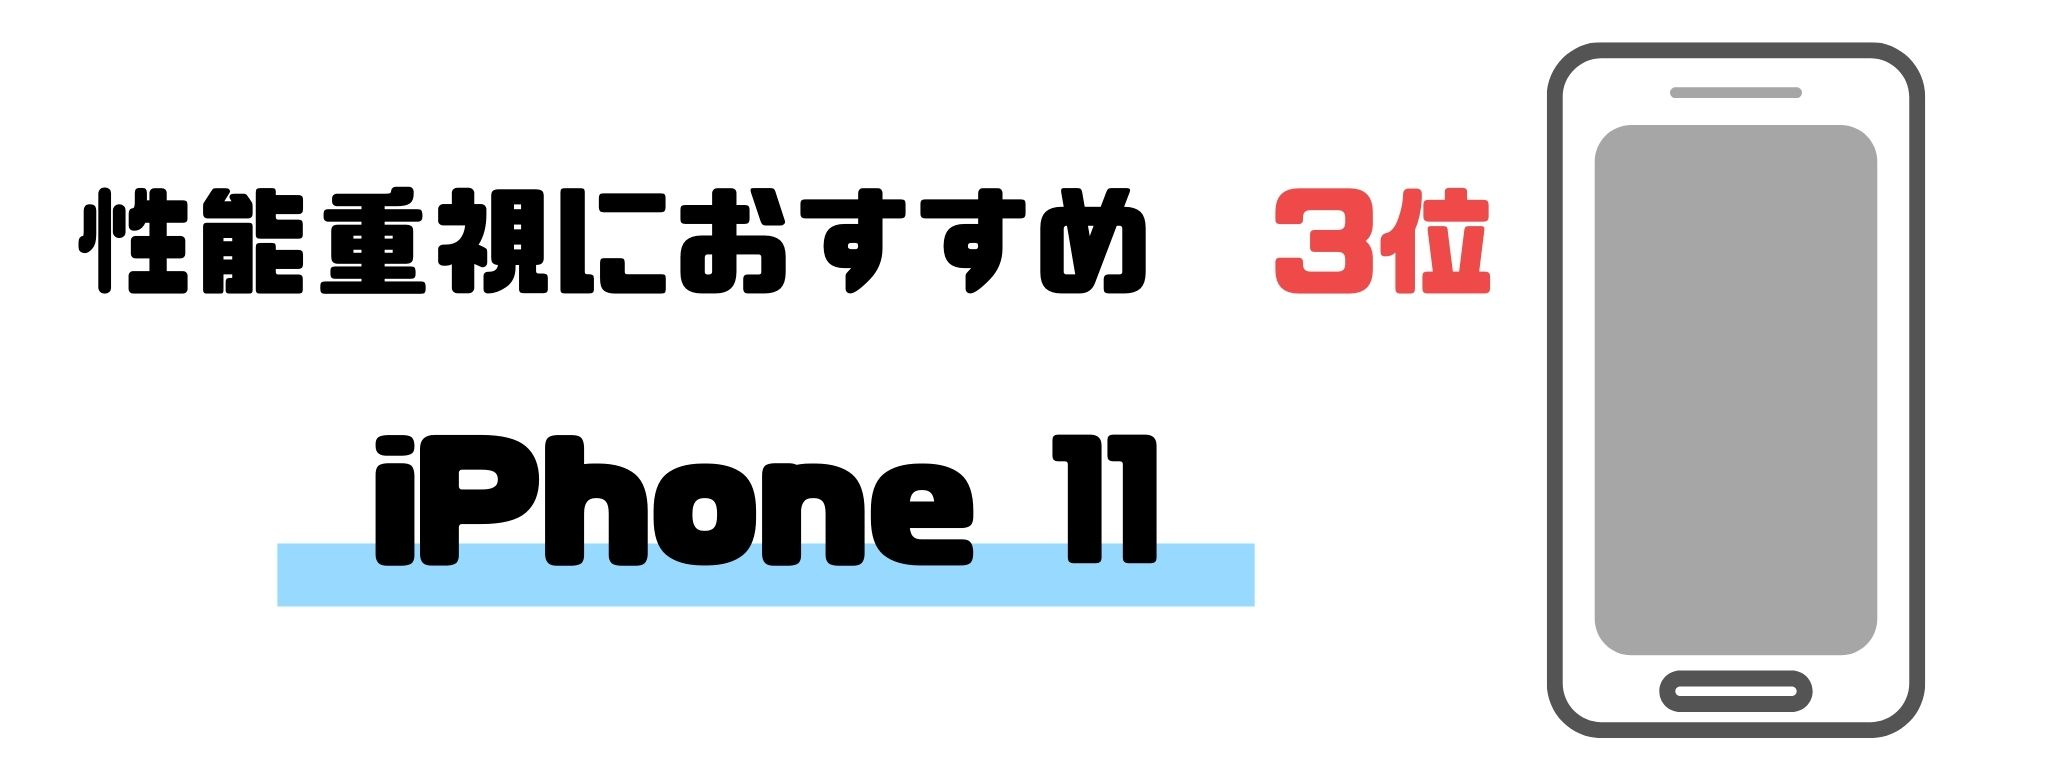 iPhone_おすすめ_性能3